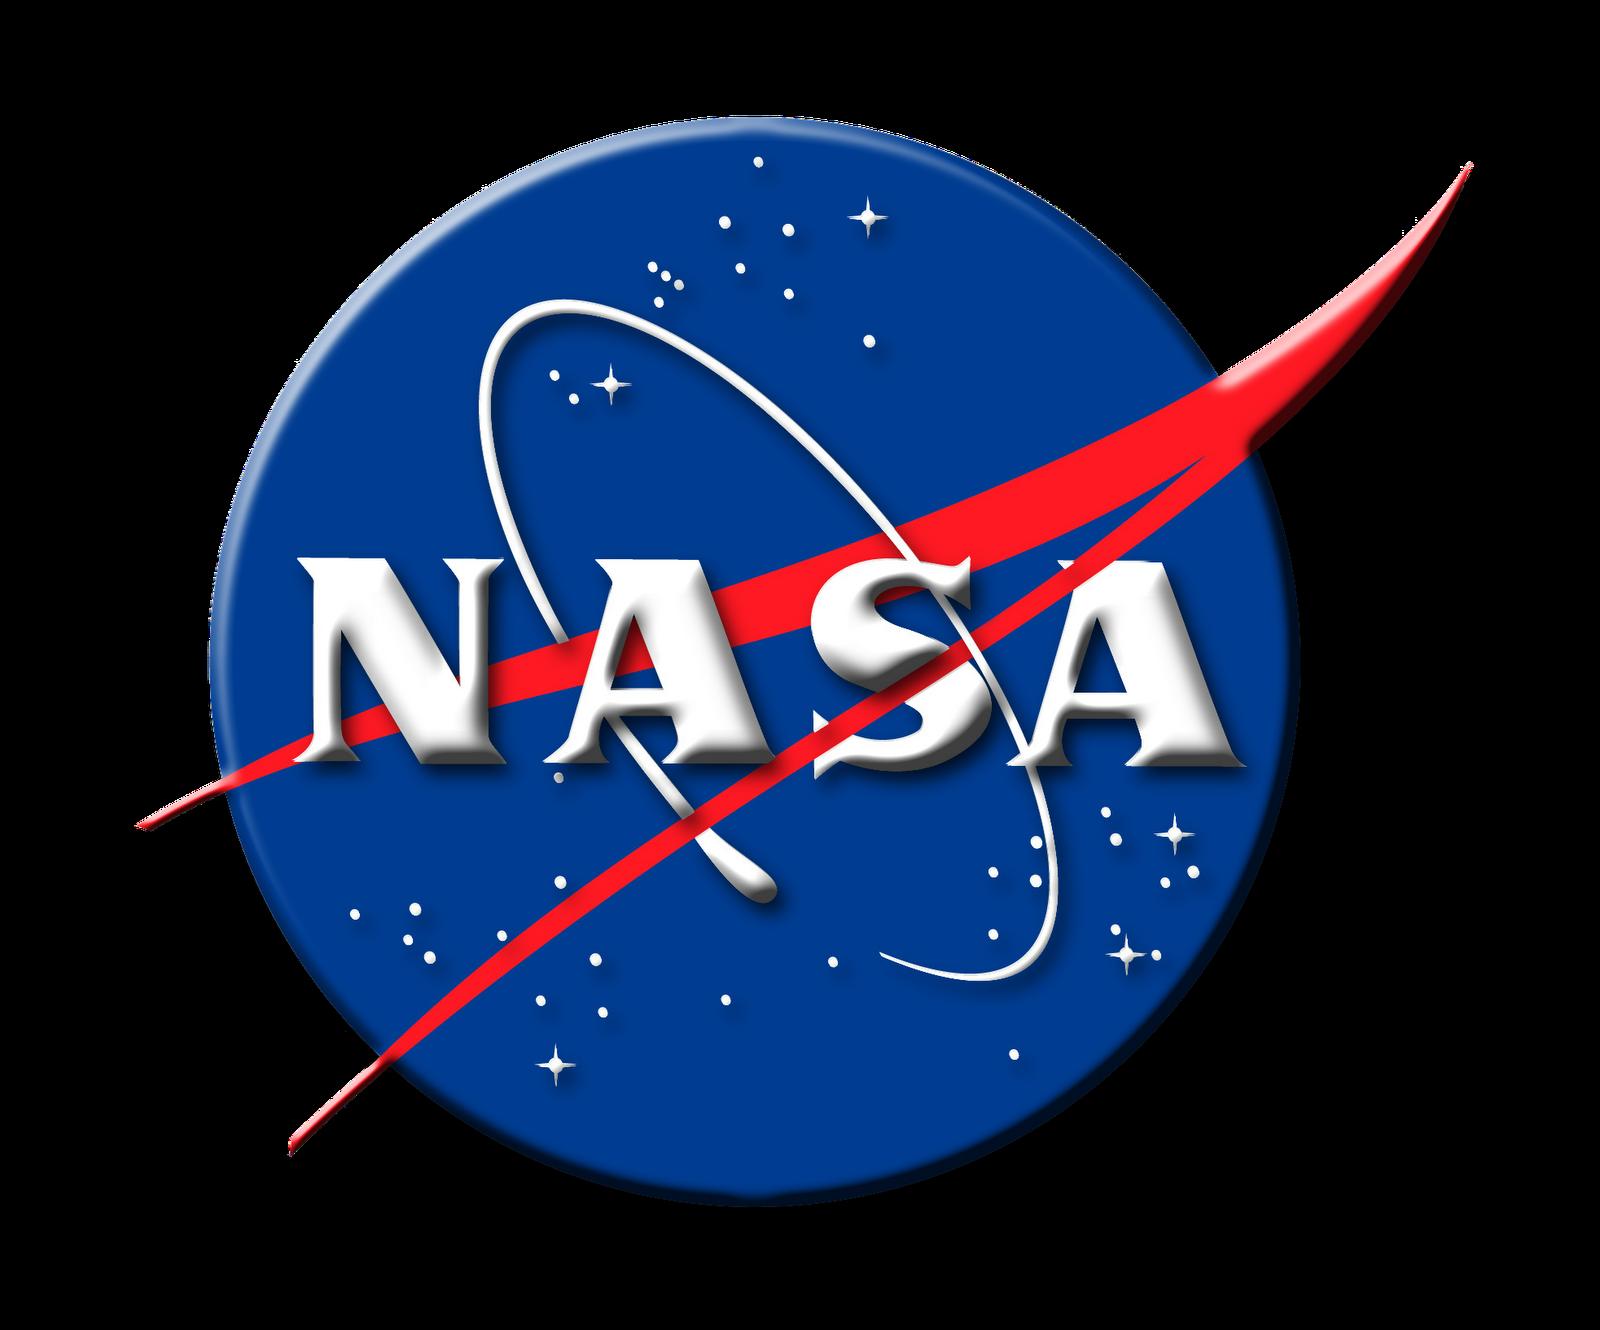 Nasa Logo Wallpaper 1600x1330